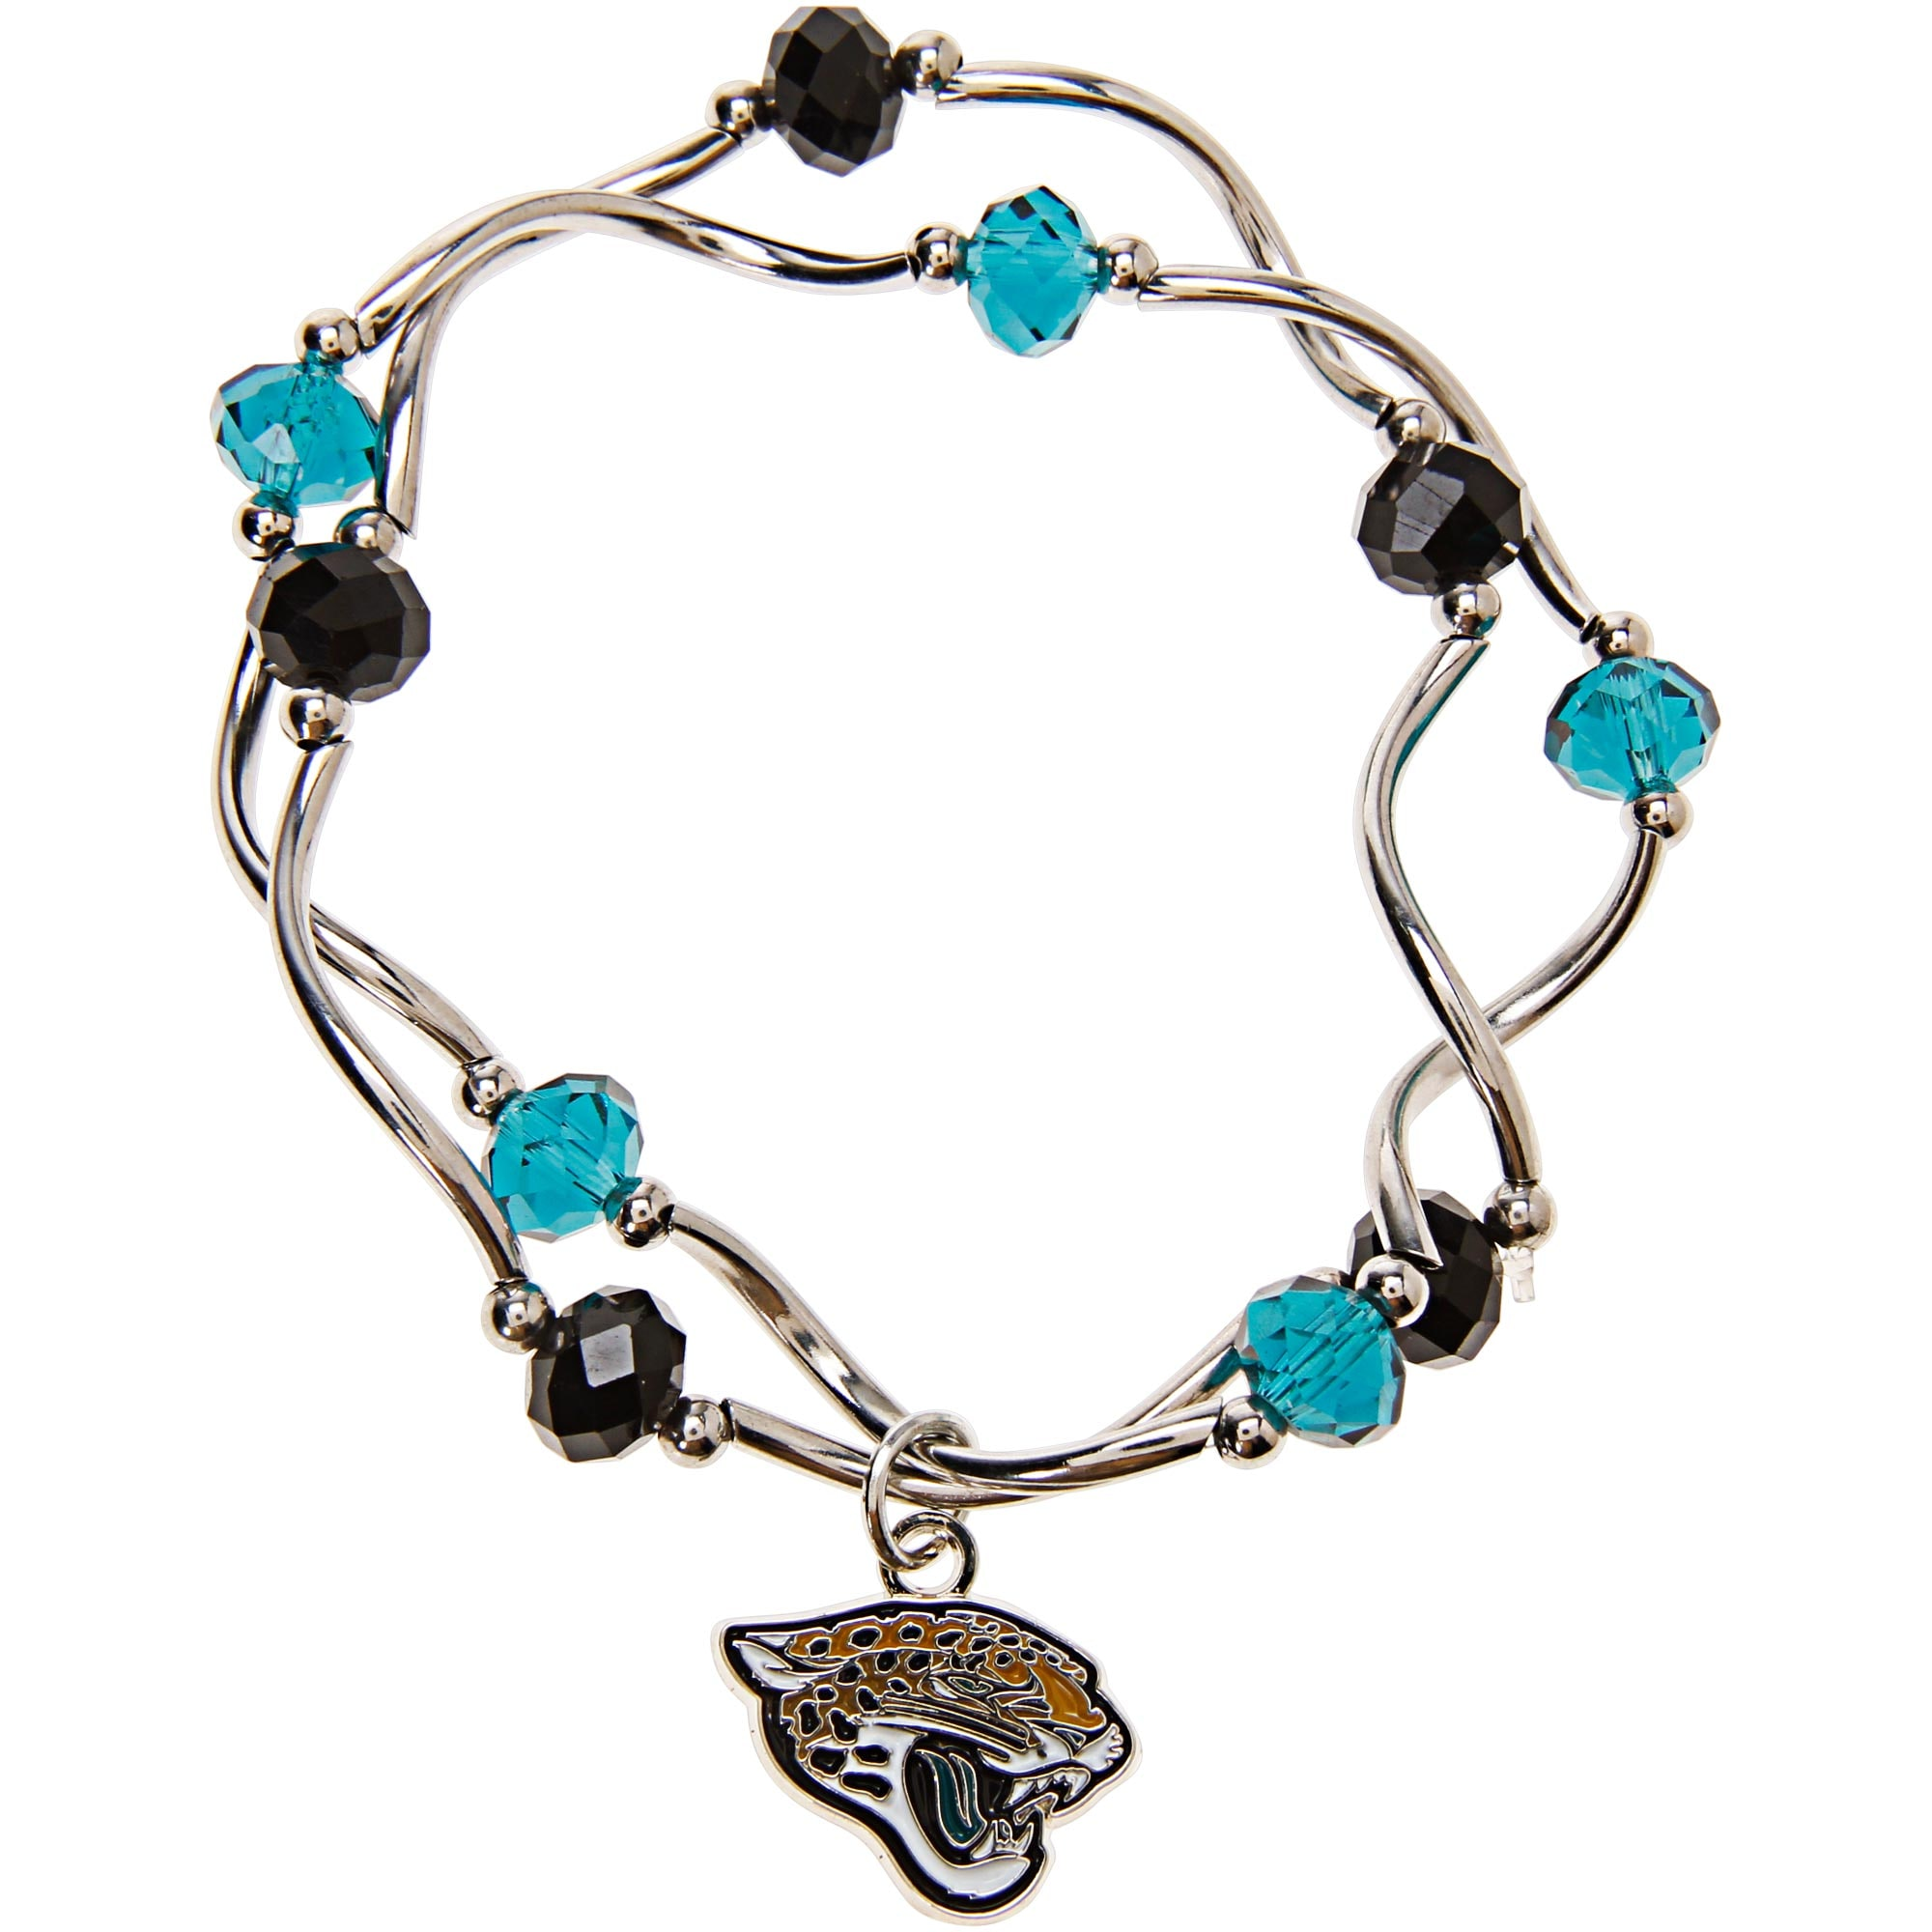 Jacksonville Jaguars Women's Bead Stretch Bracelet